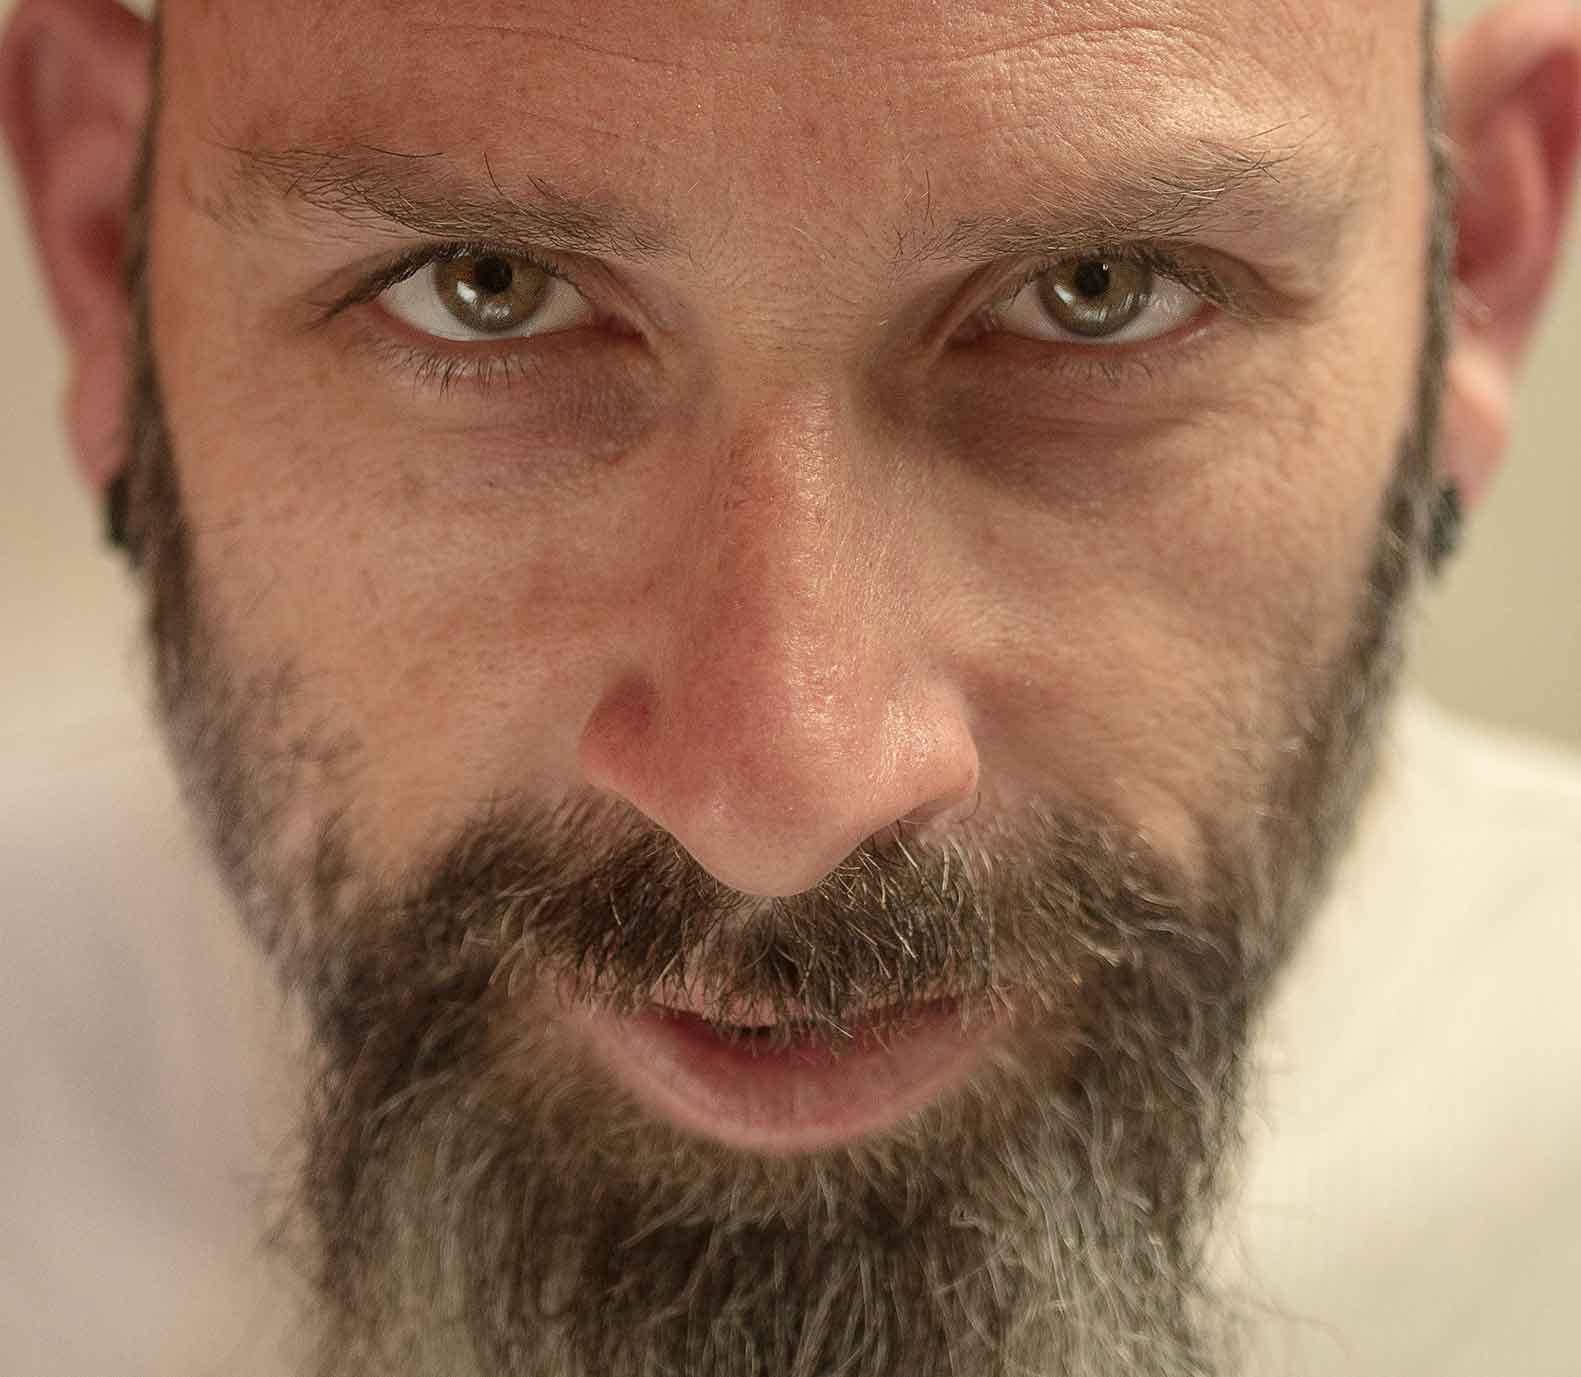 retrato primer plano hombre ojos verdes simula Hannibal Lecter